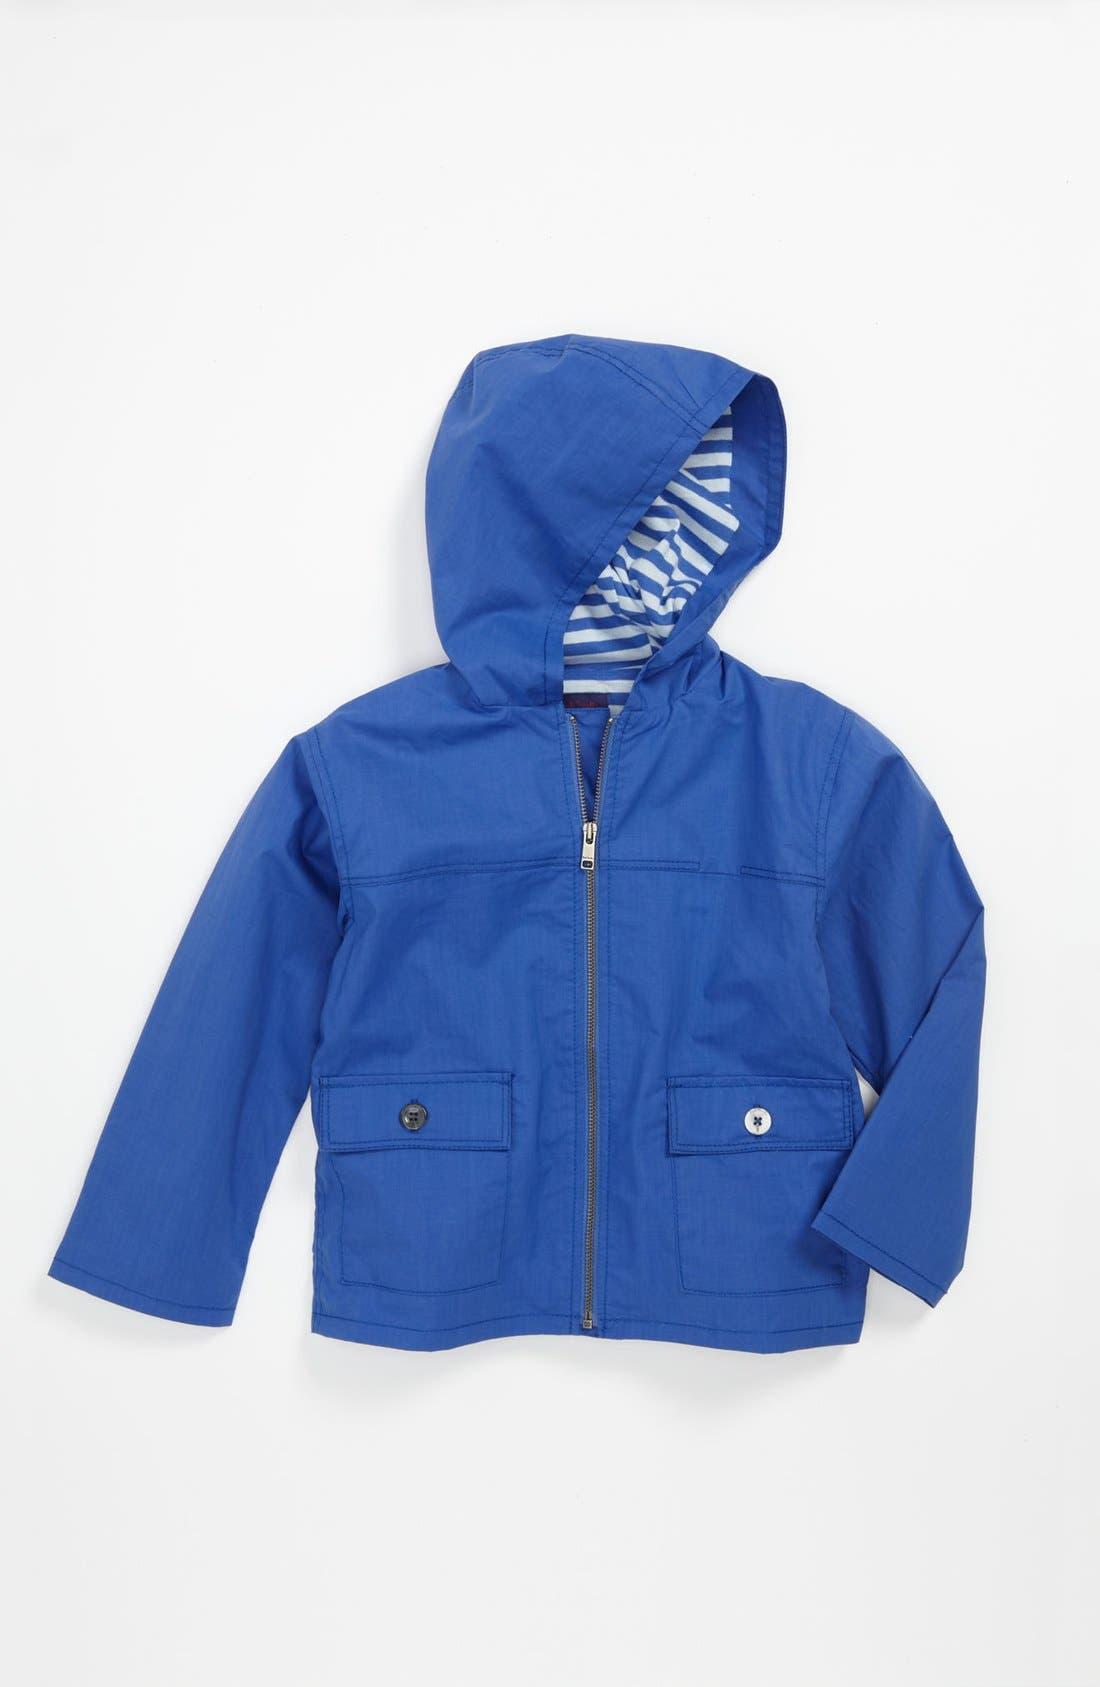 Main Image - Paul Smith Junior Jacket (Baby)